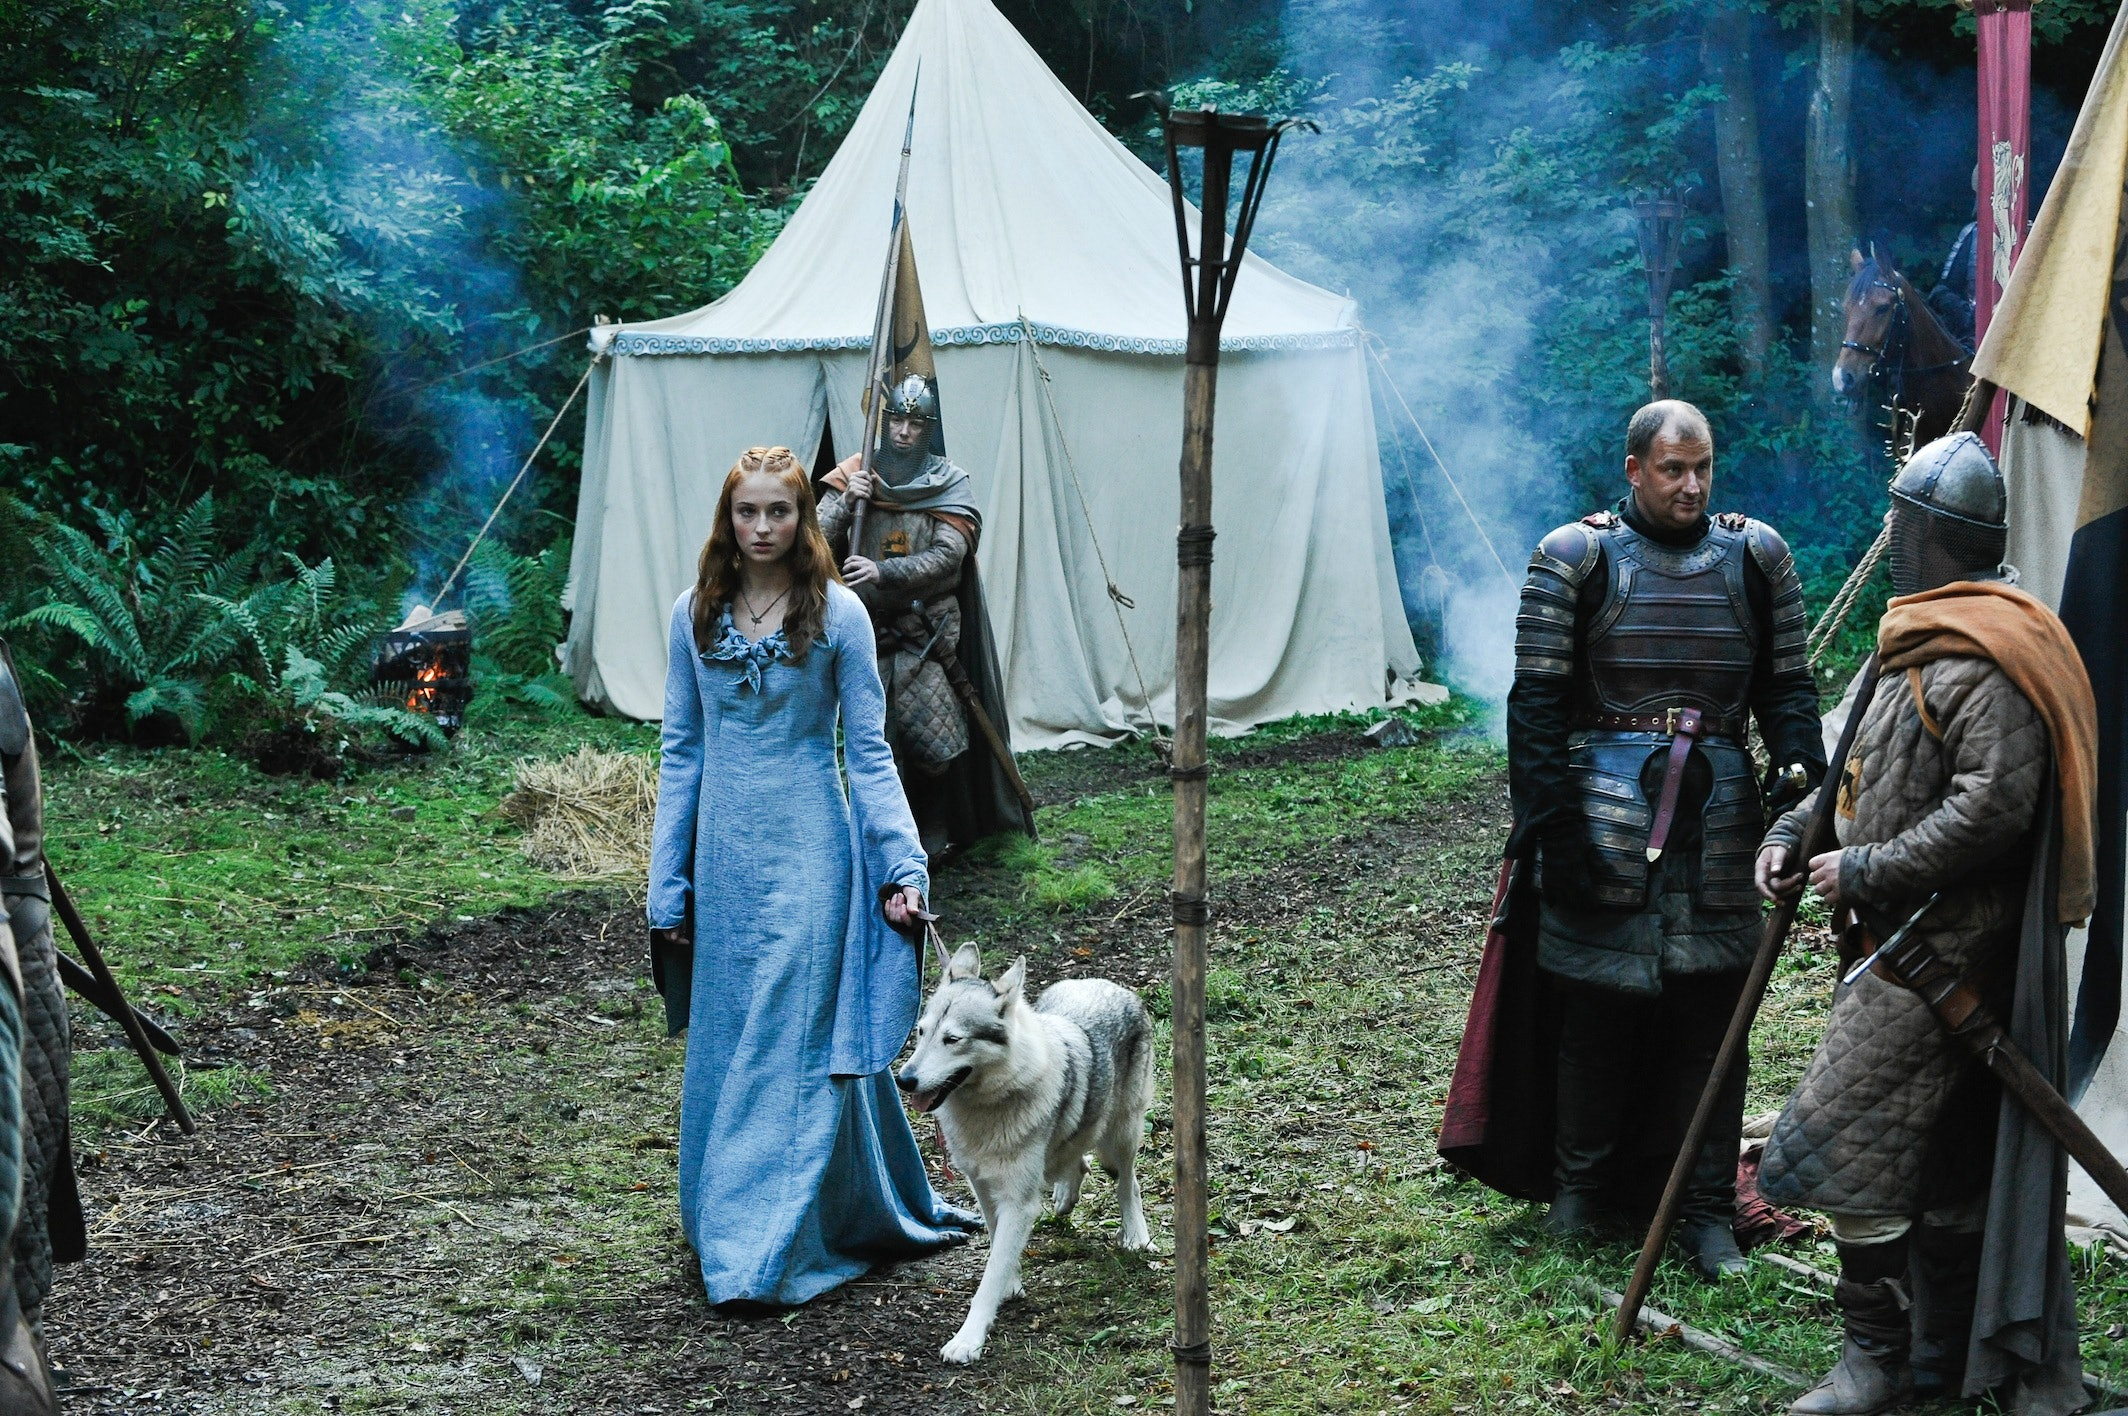 Game of thrones 4 season episode 2 online